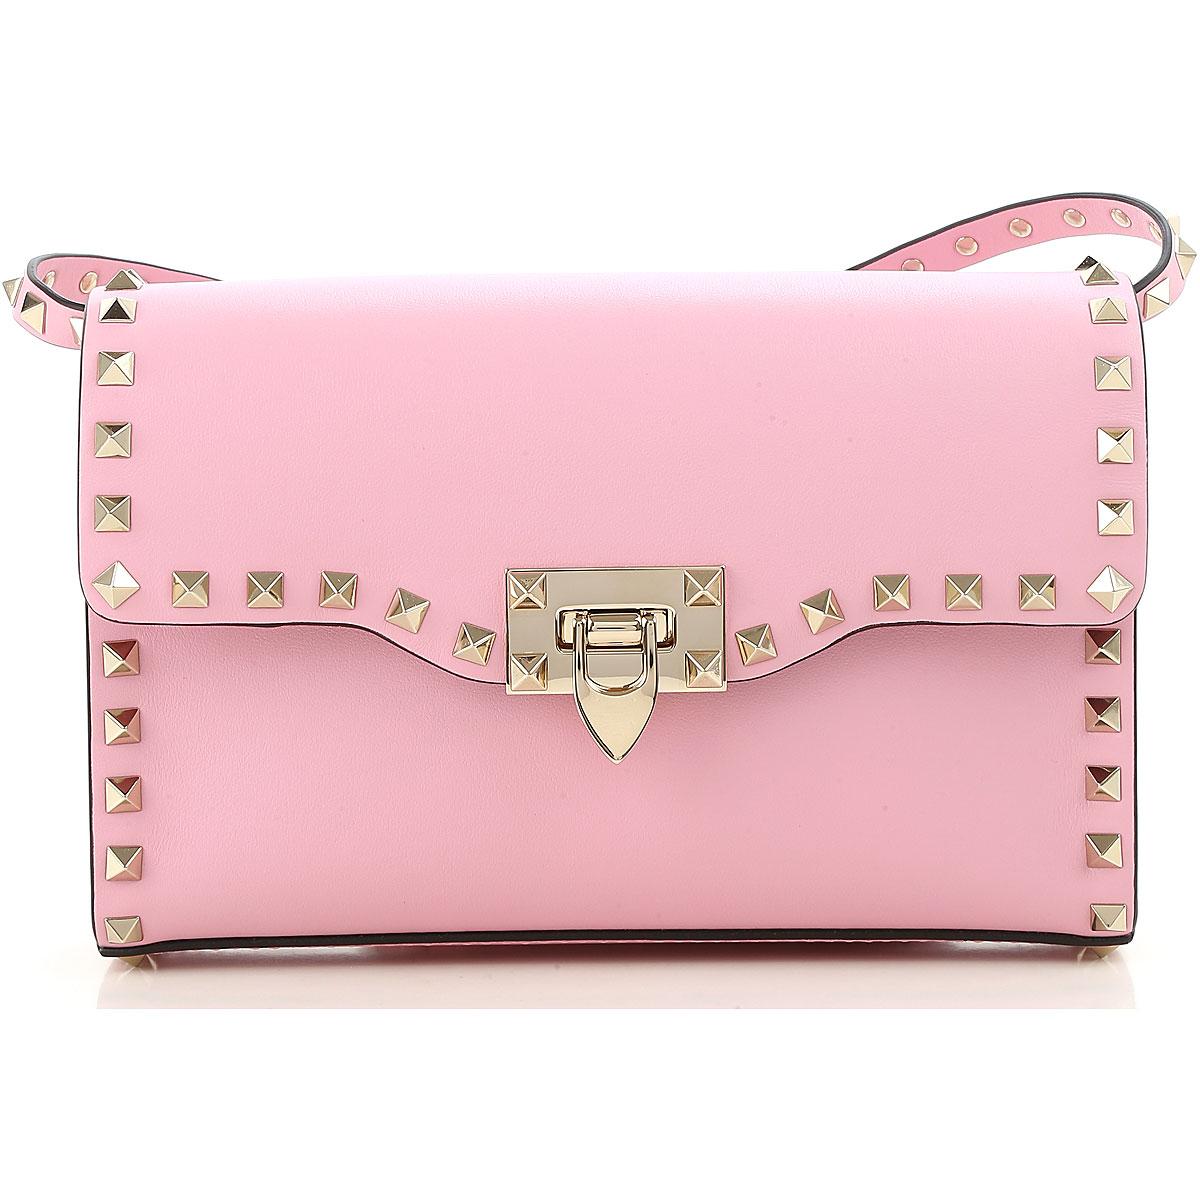 Valentino Shoulder Bag for Women, Pink, Leather, 2017 USA-466154